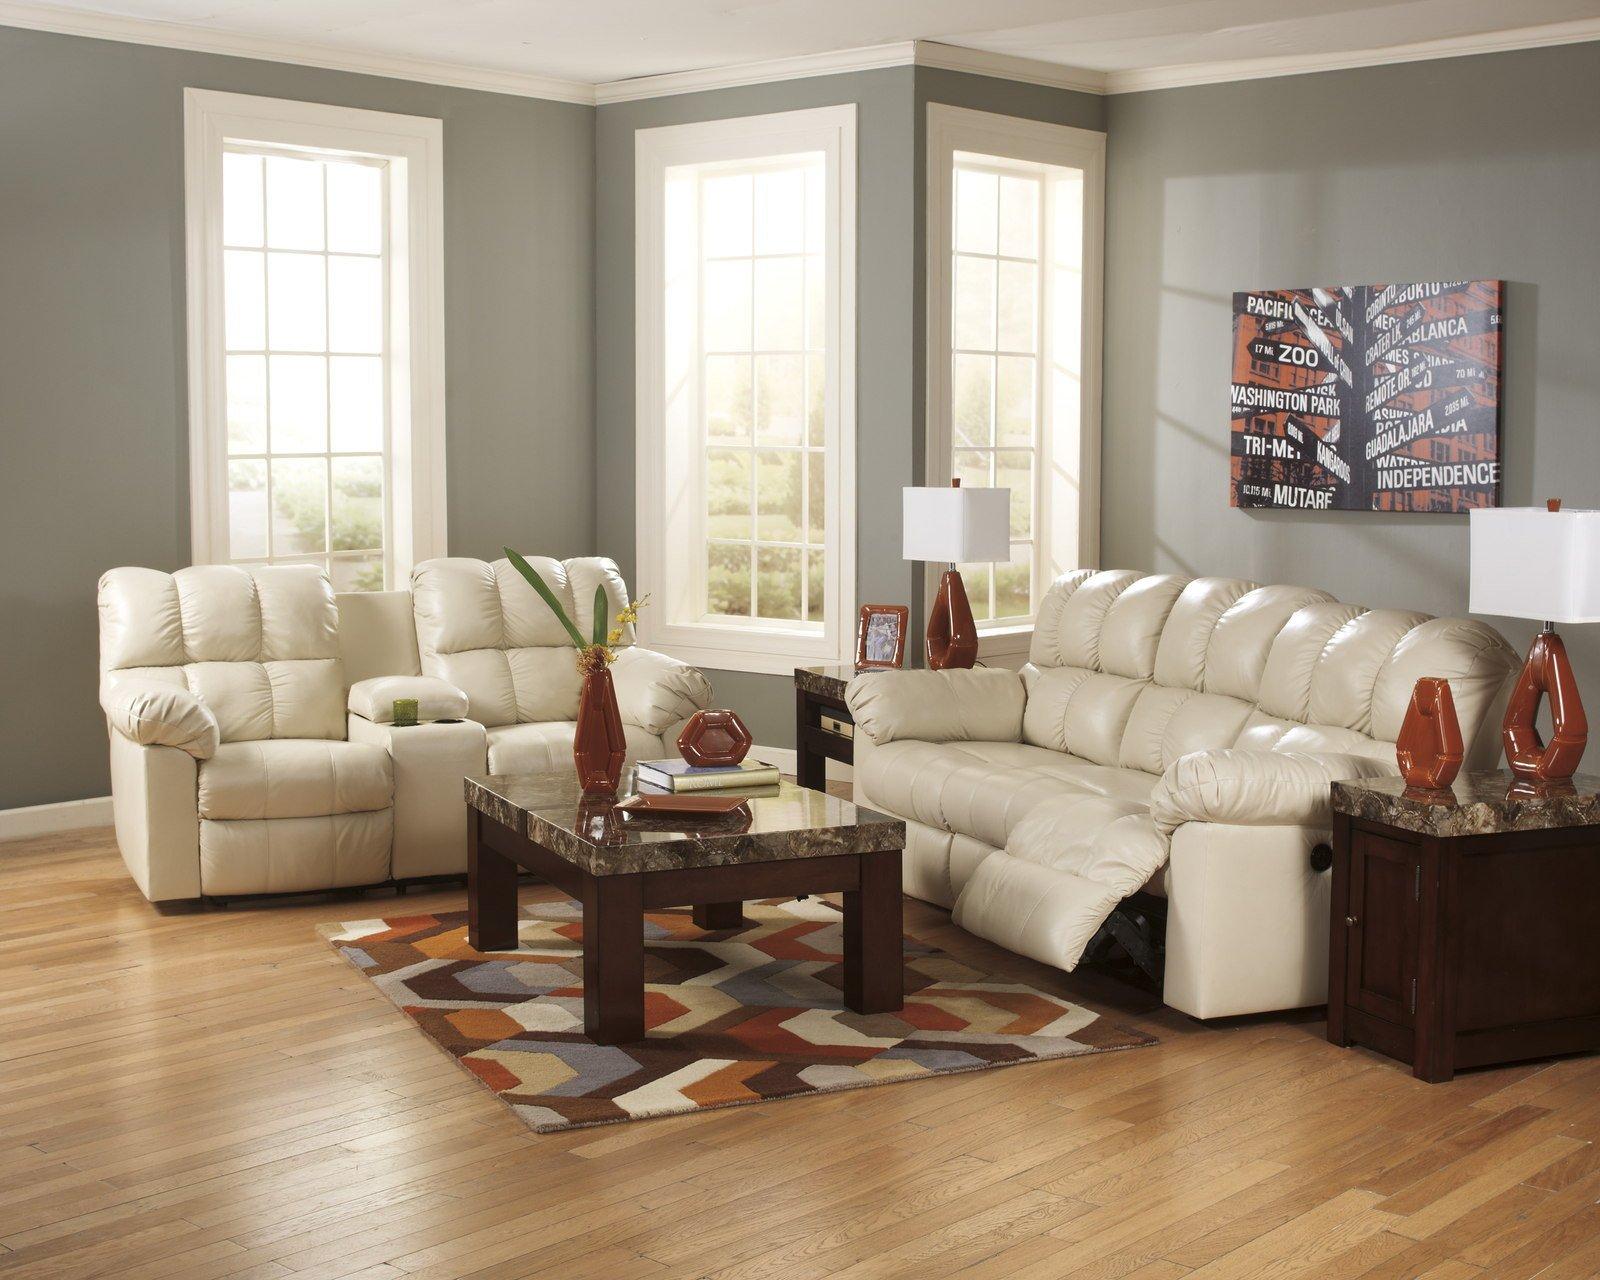 Most Comfortable Living Roomfurniture Fresh Most fortable Living Room Chair Zion Star